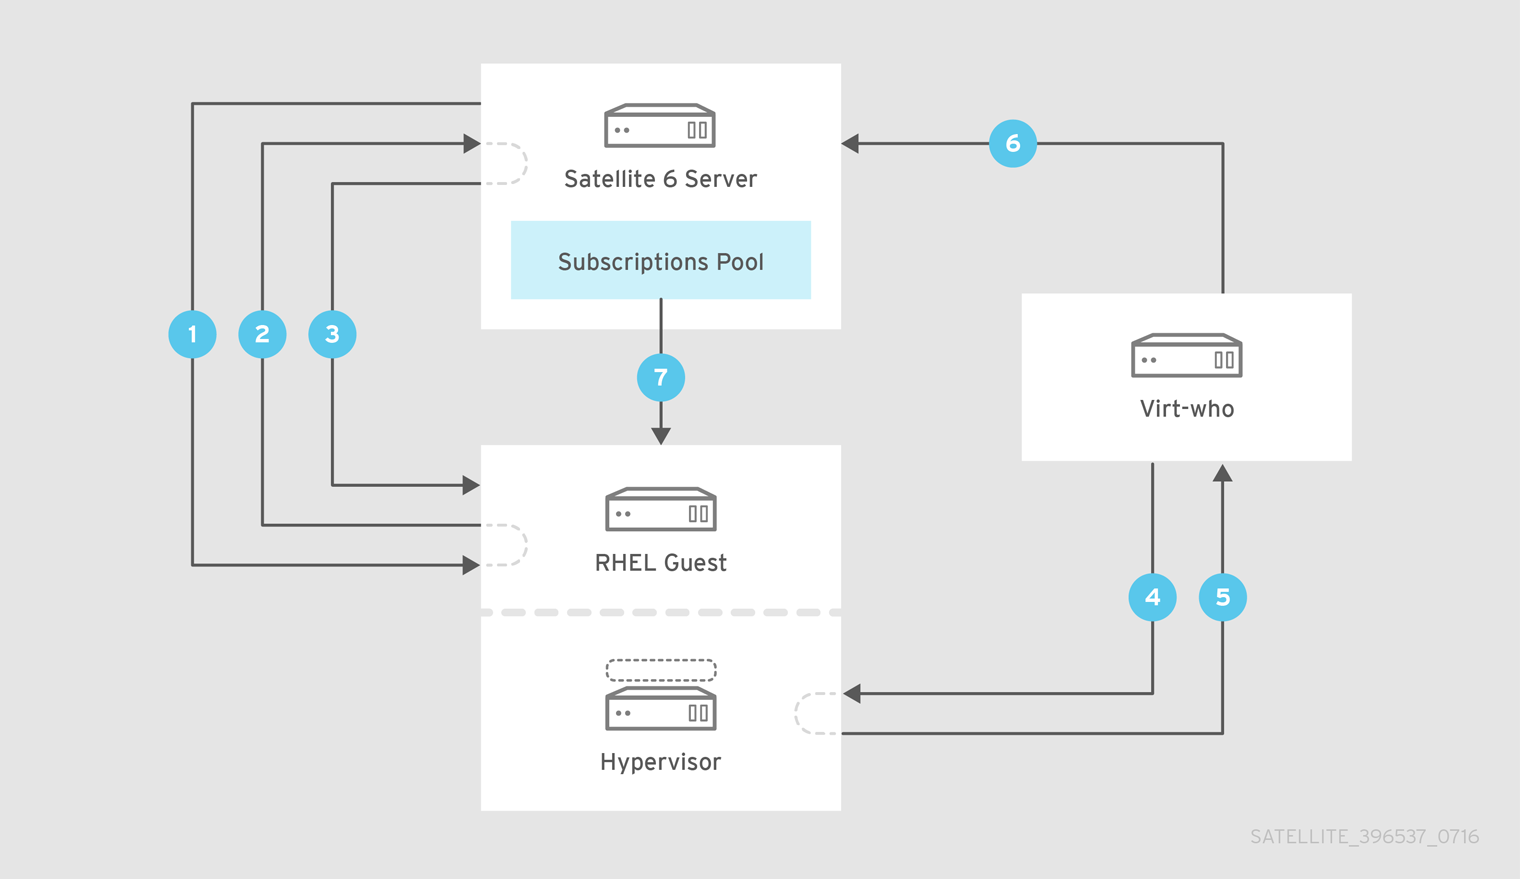 Virtual Machine Subscription Process